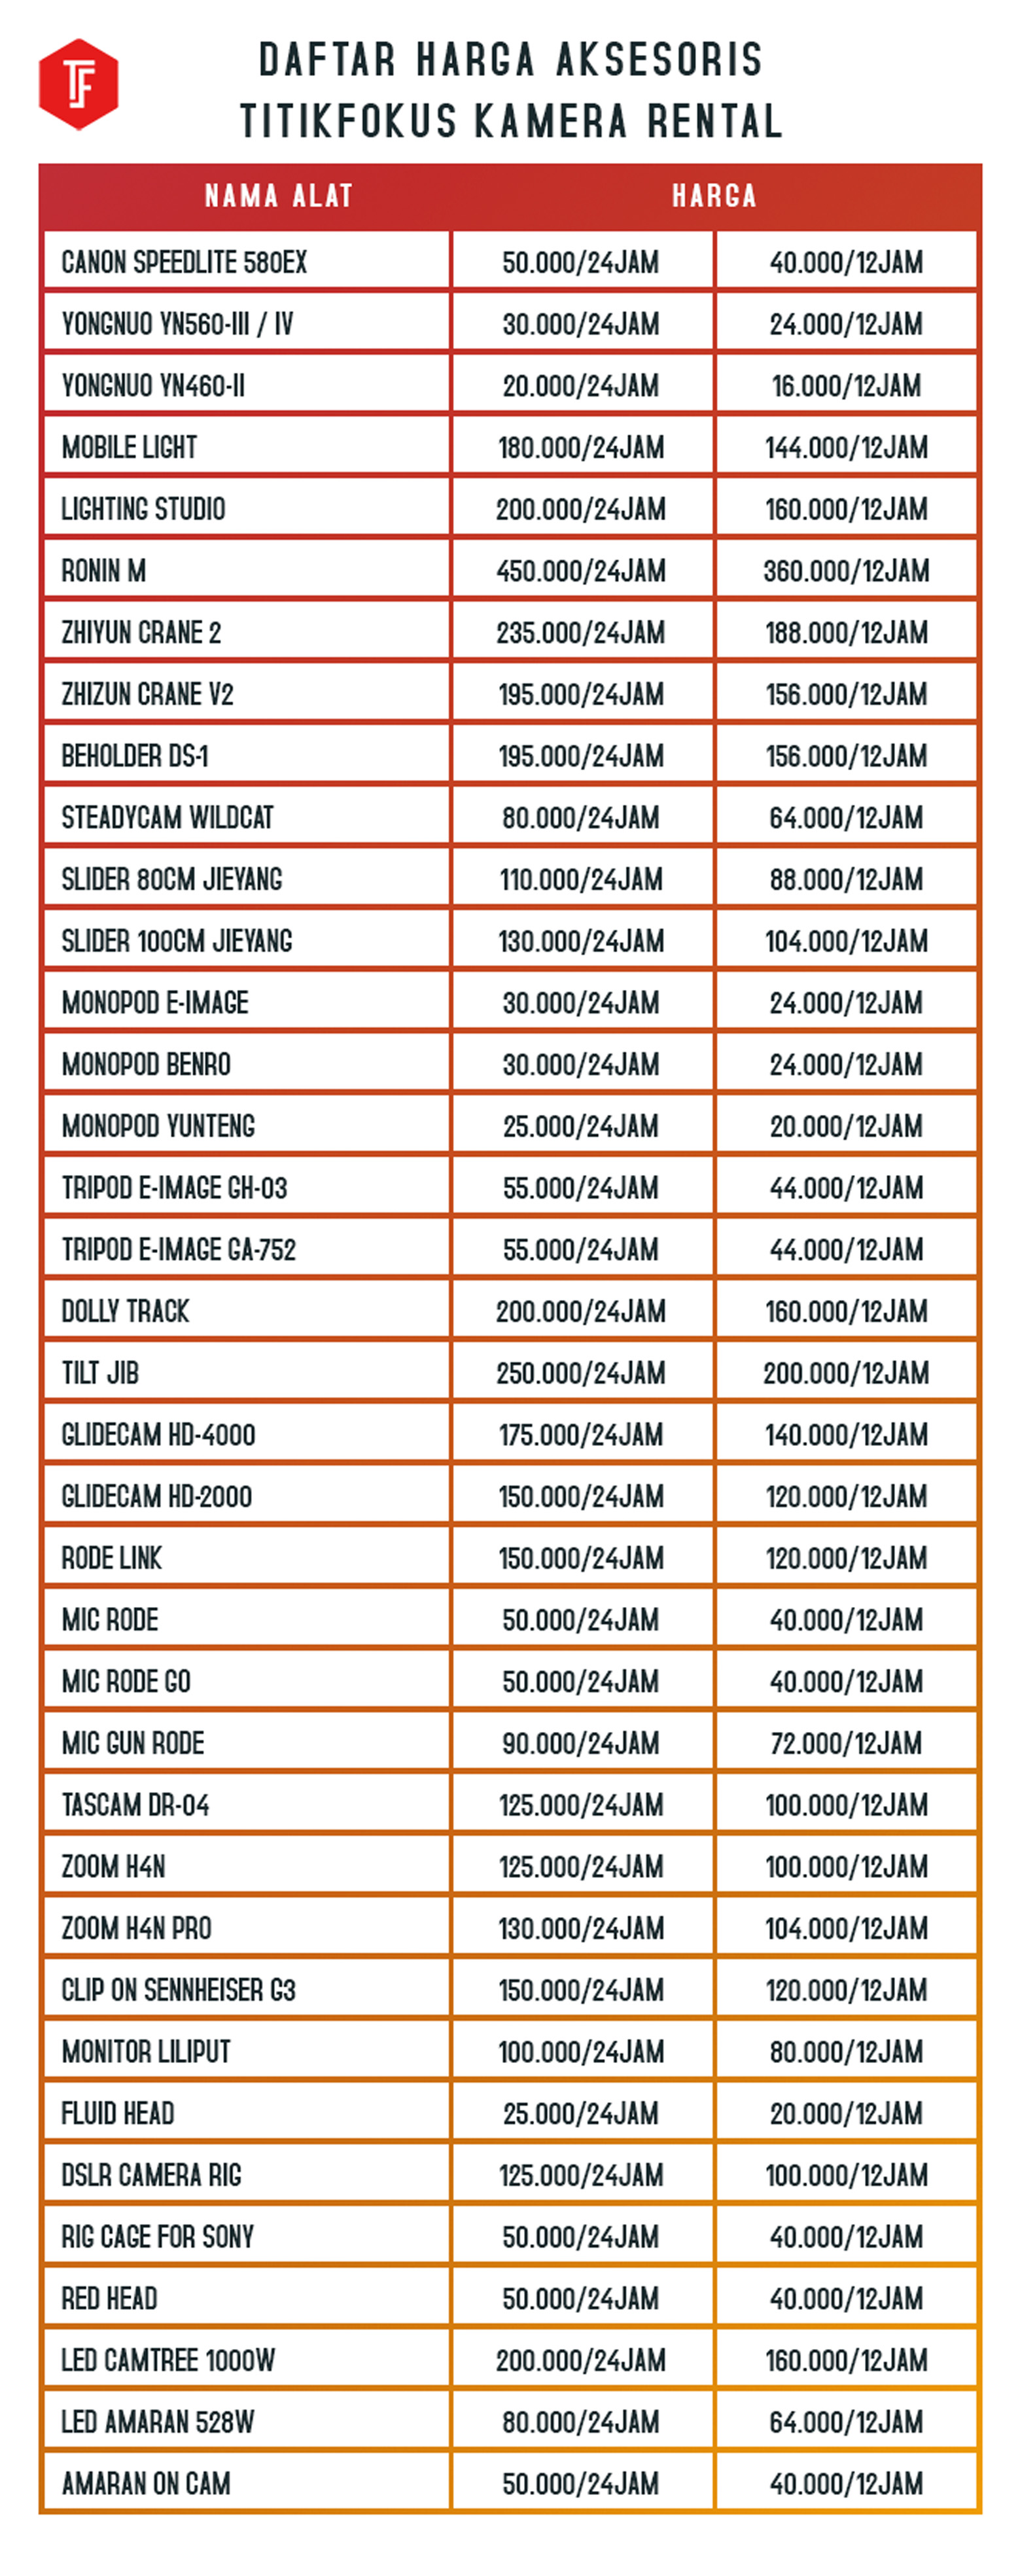 Daftar Harga TF Aksesoris Magelang